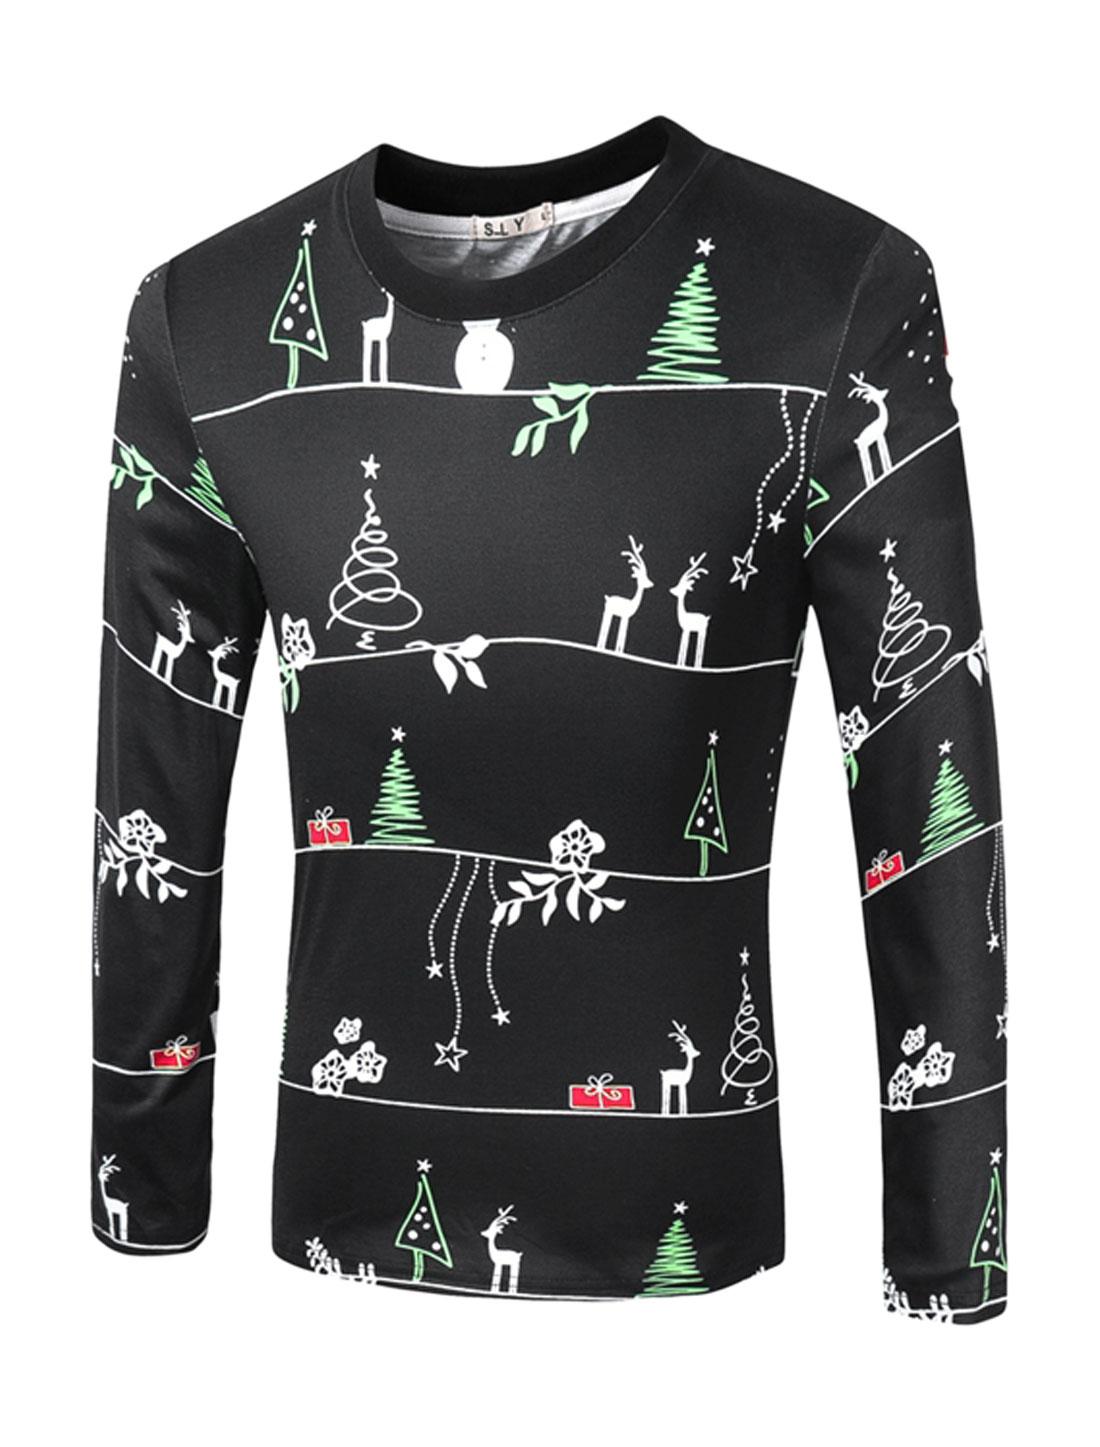 Man Crew Neck Moose Floral Stars Snowman Tee Shirt Black M